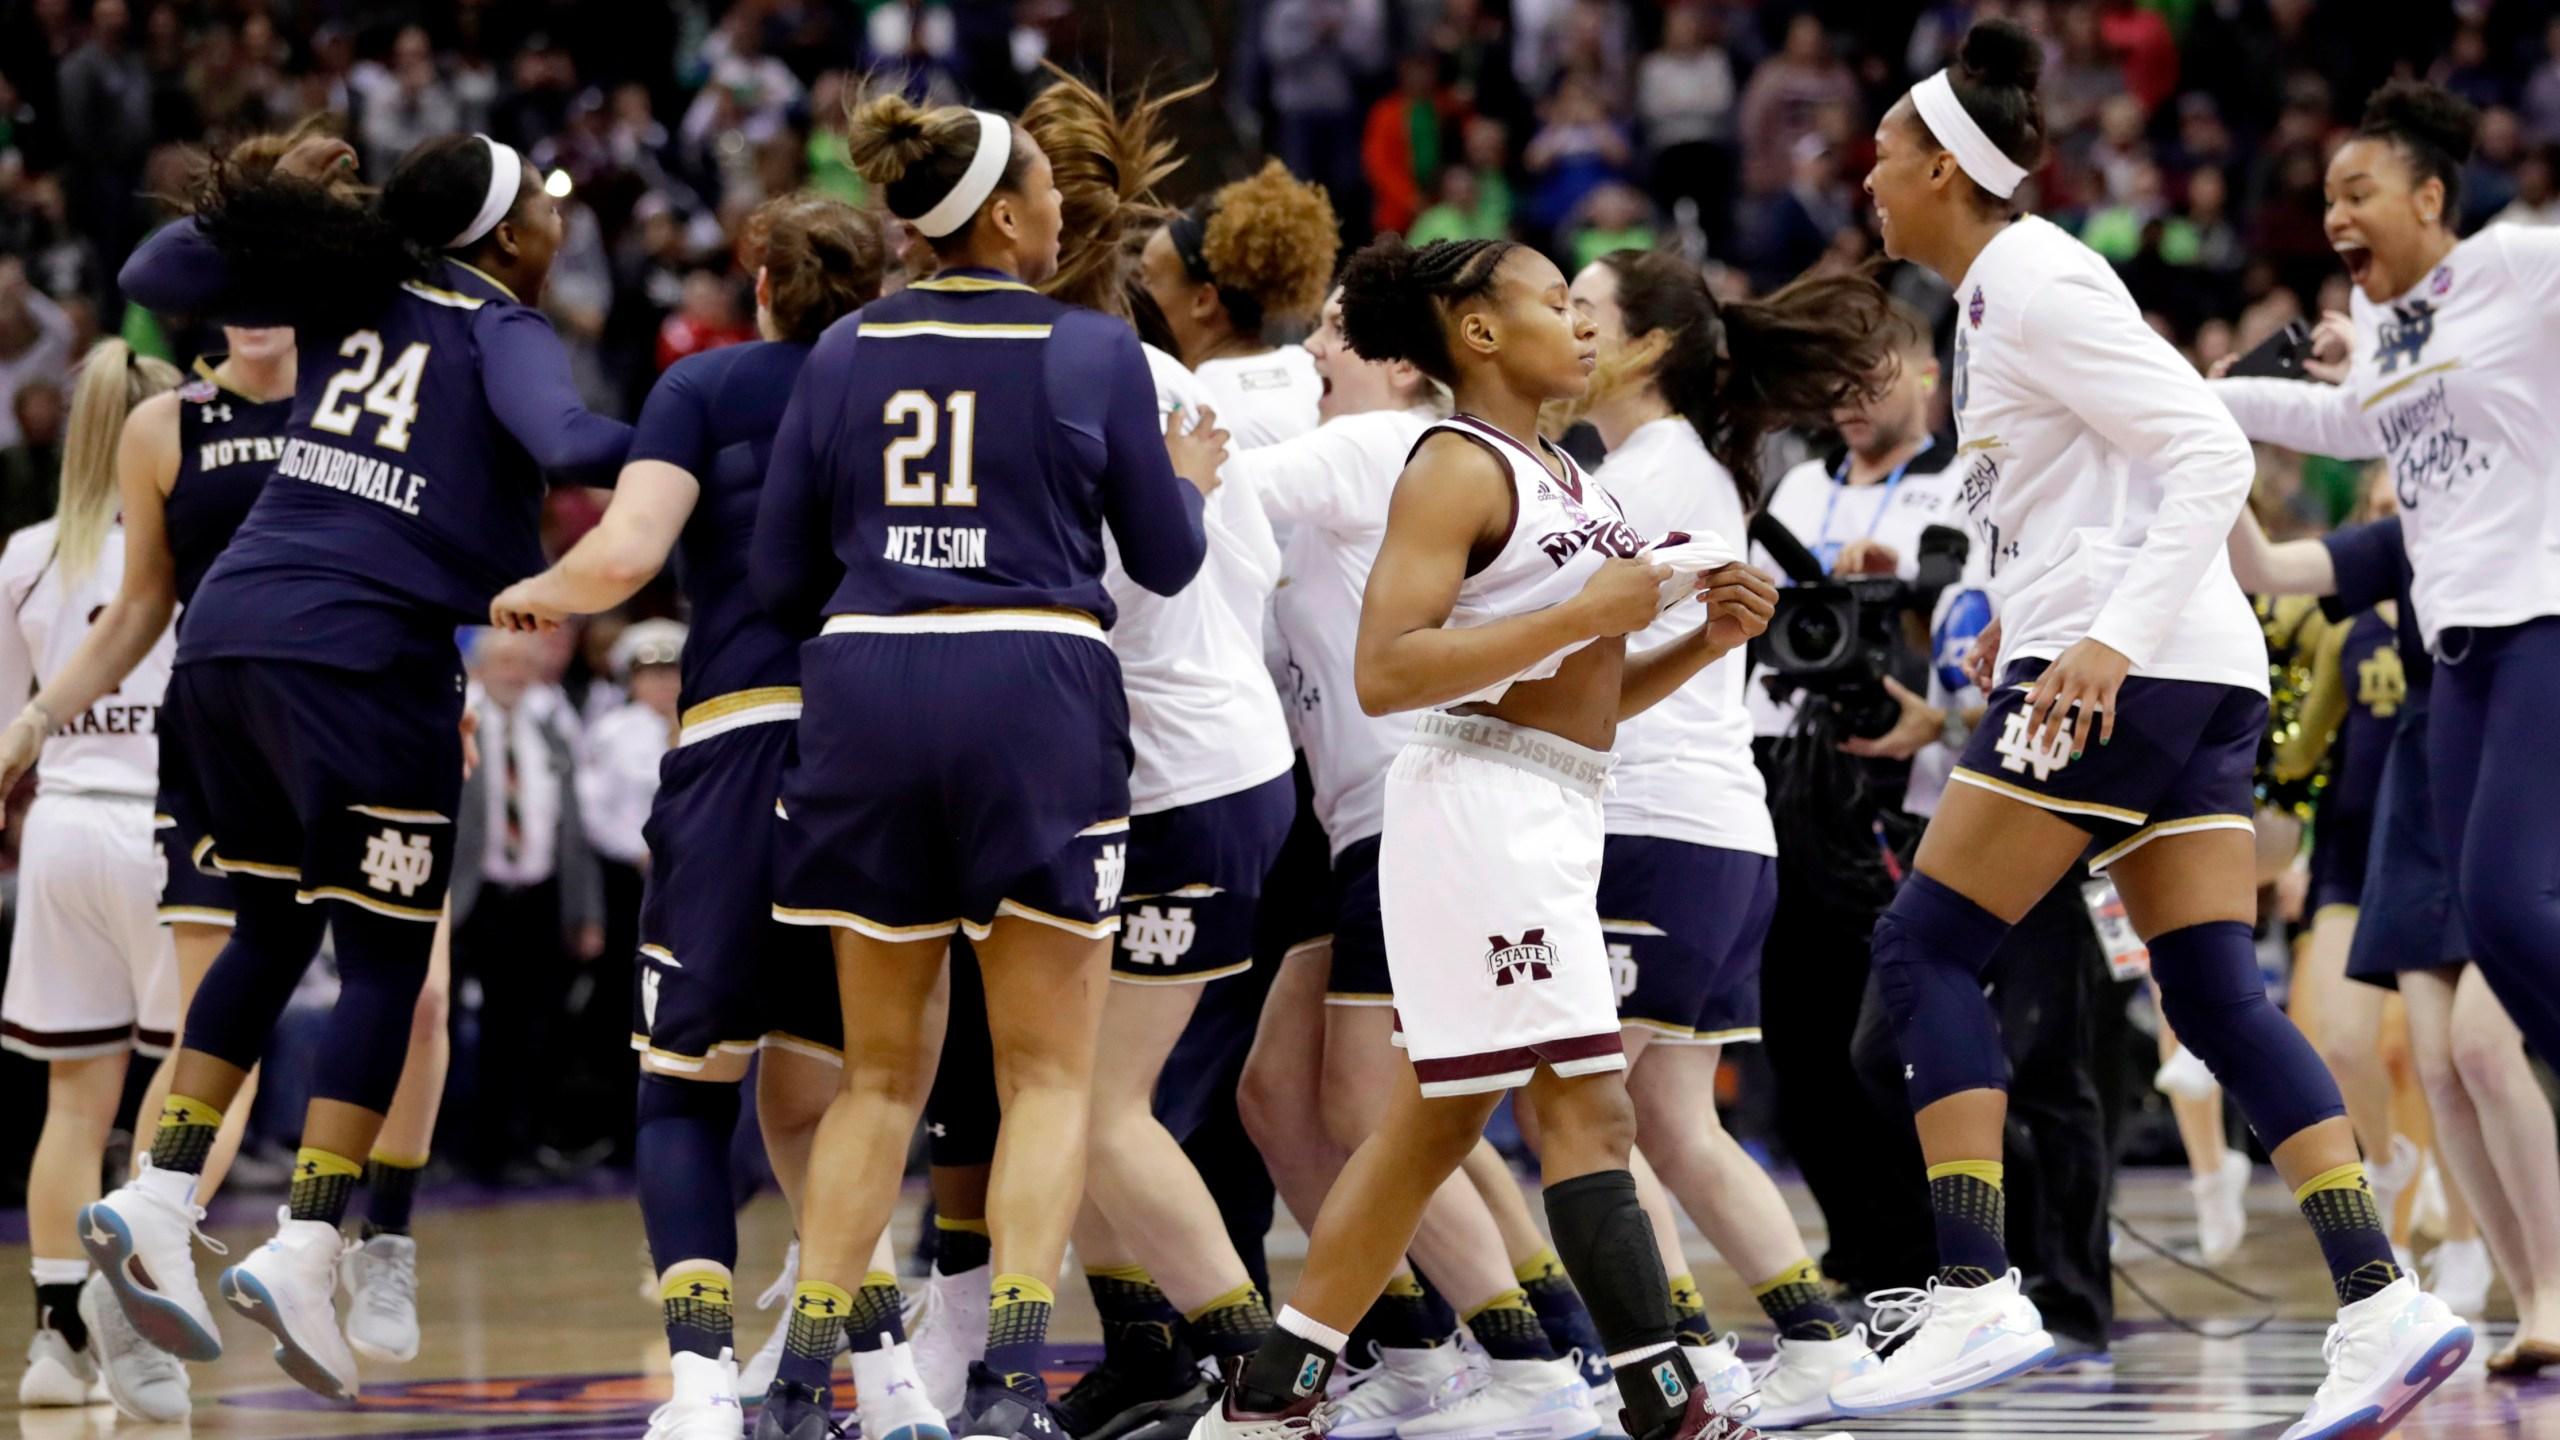 NCAA_Championship_Notre_Dame_Mississippi_St_Basketball_44559-159532.jpg52990048